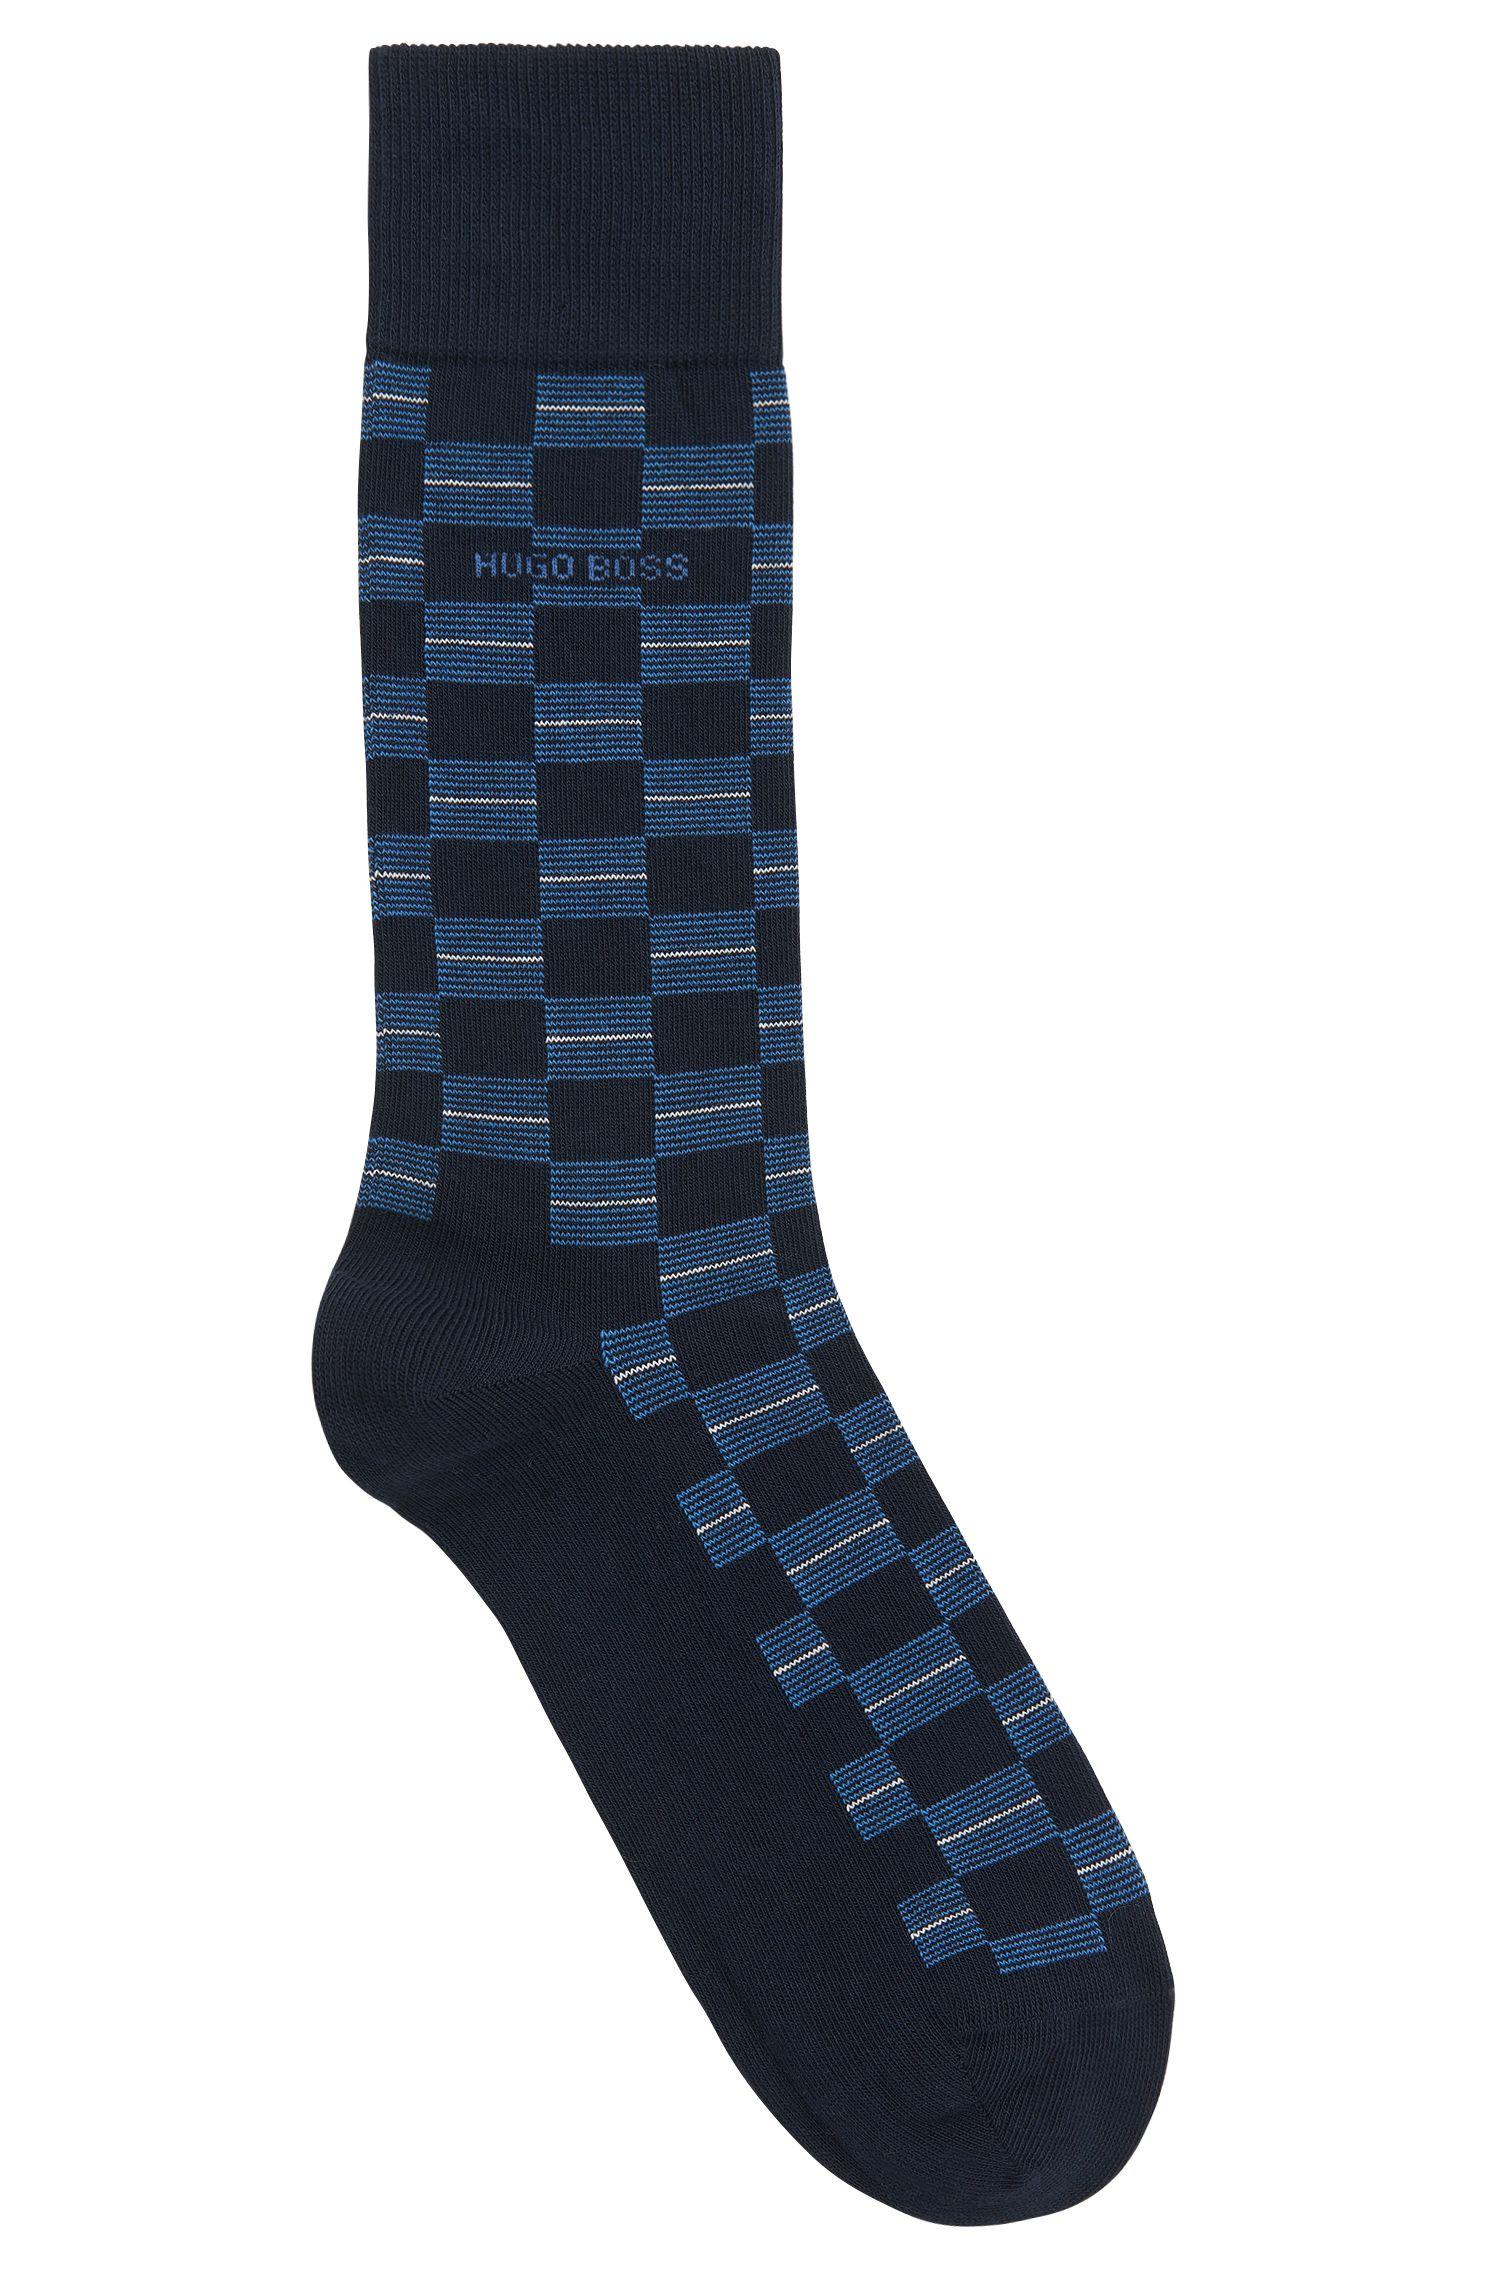 Checked Stretch Cotton Blend Socks | RS Check US CC